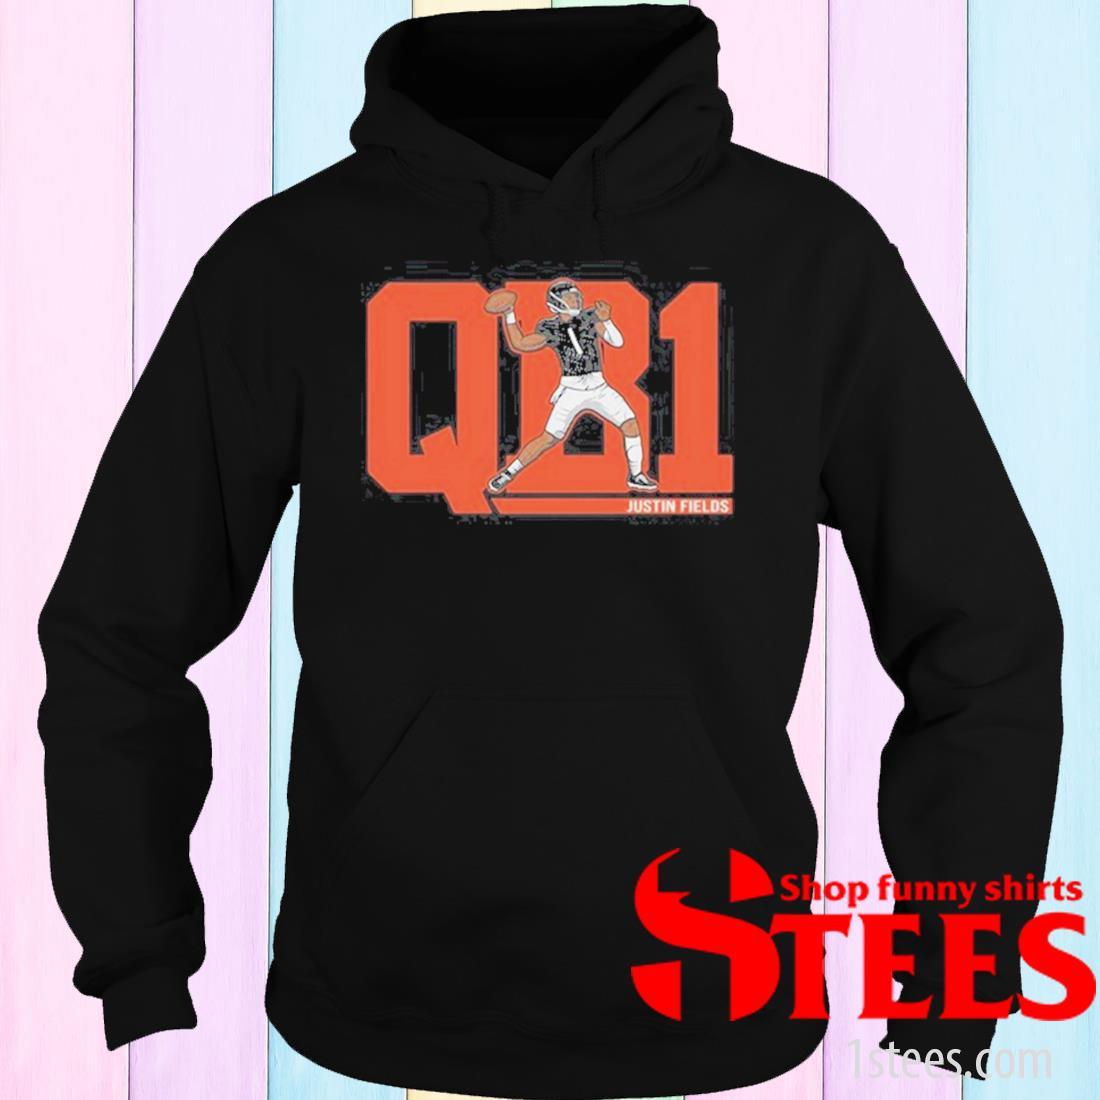 QB1 Justin Fields Shirt hoodie